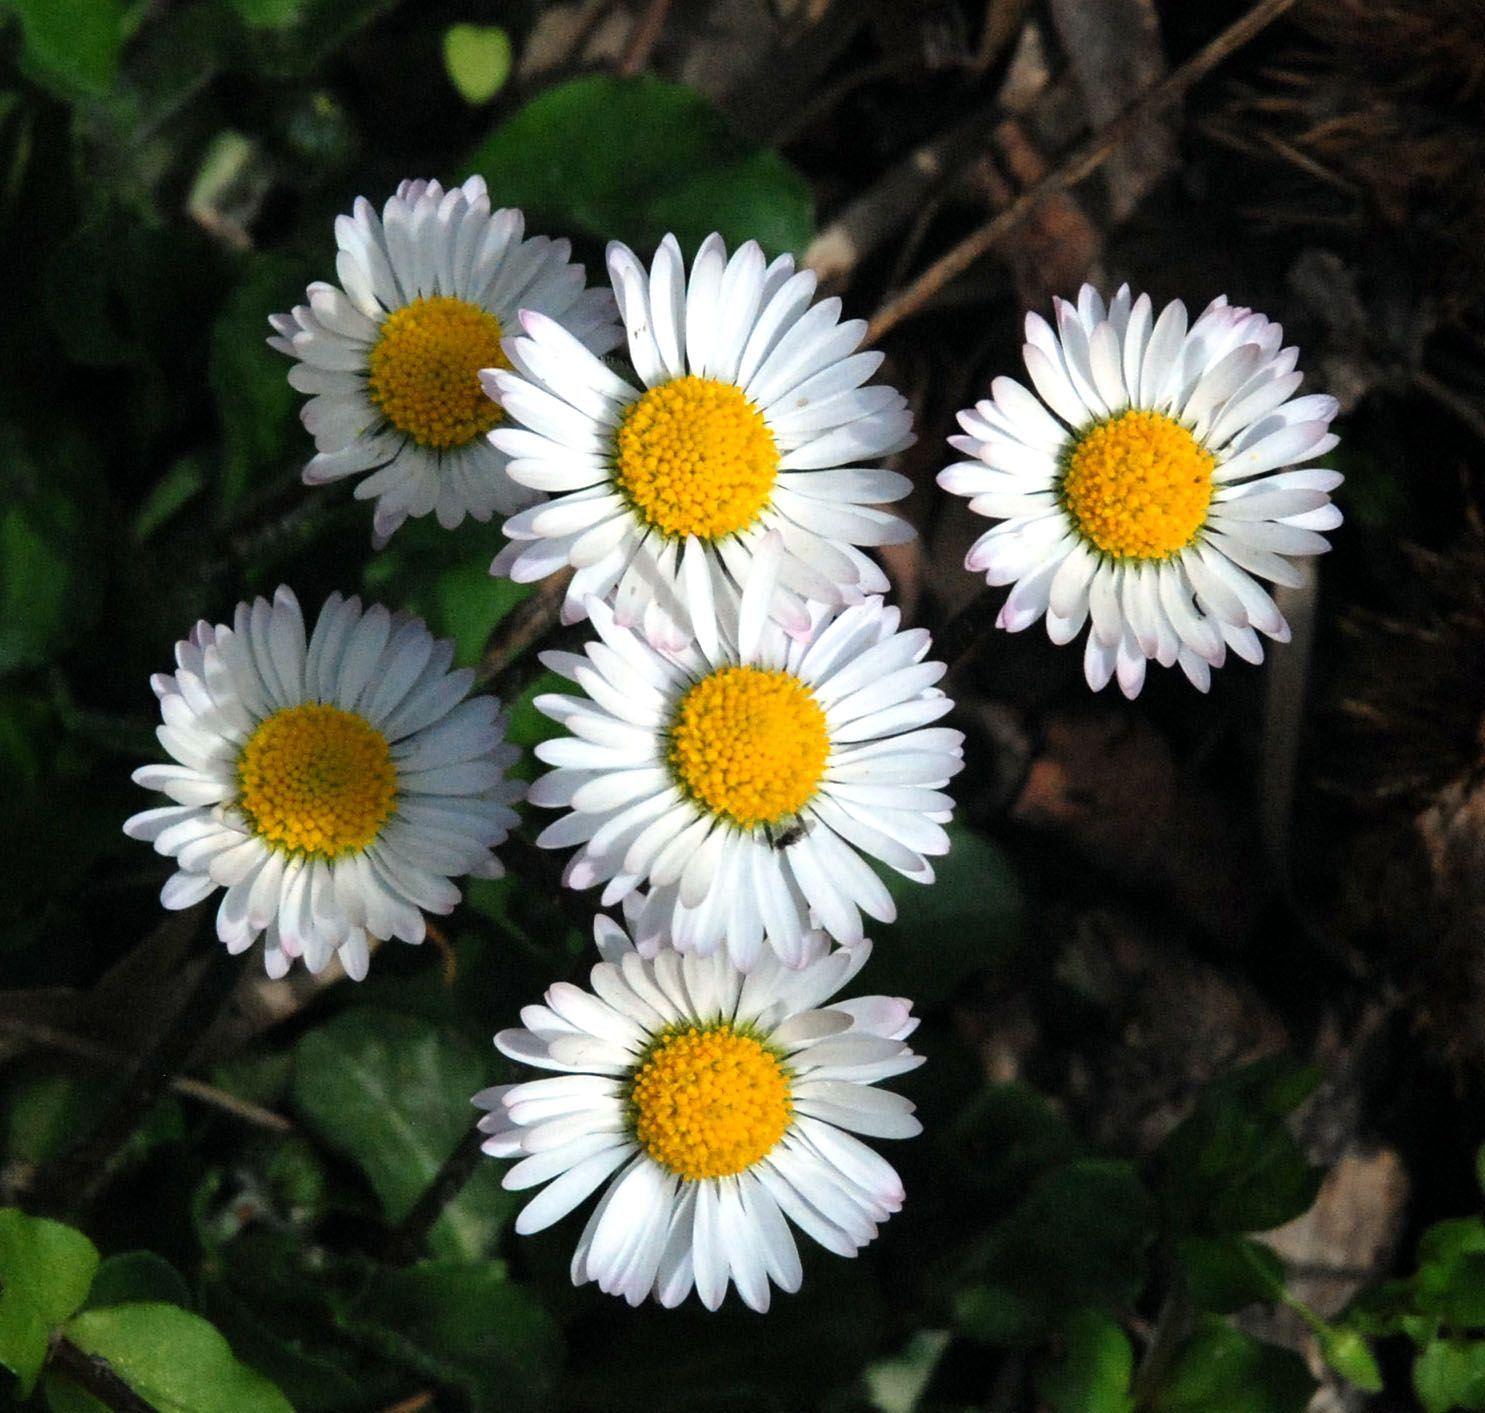 http://cheznectarine.c.h.pic.centerblog.net/o/8f1c76bb.JPG